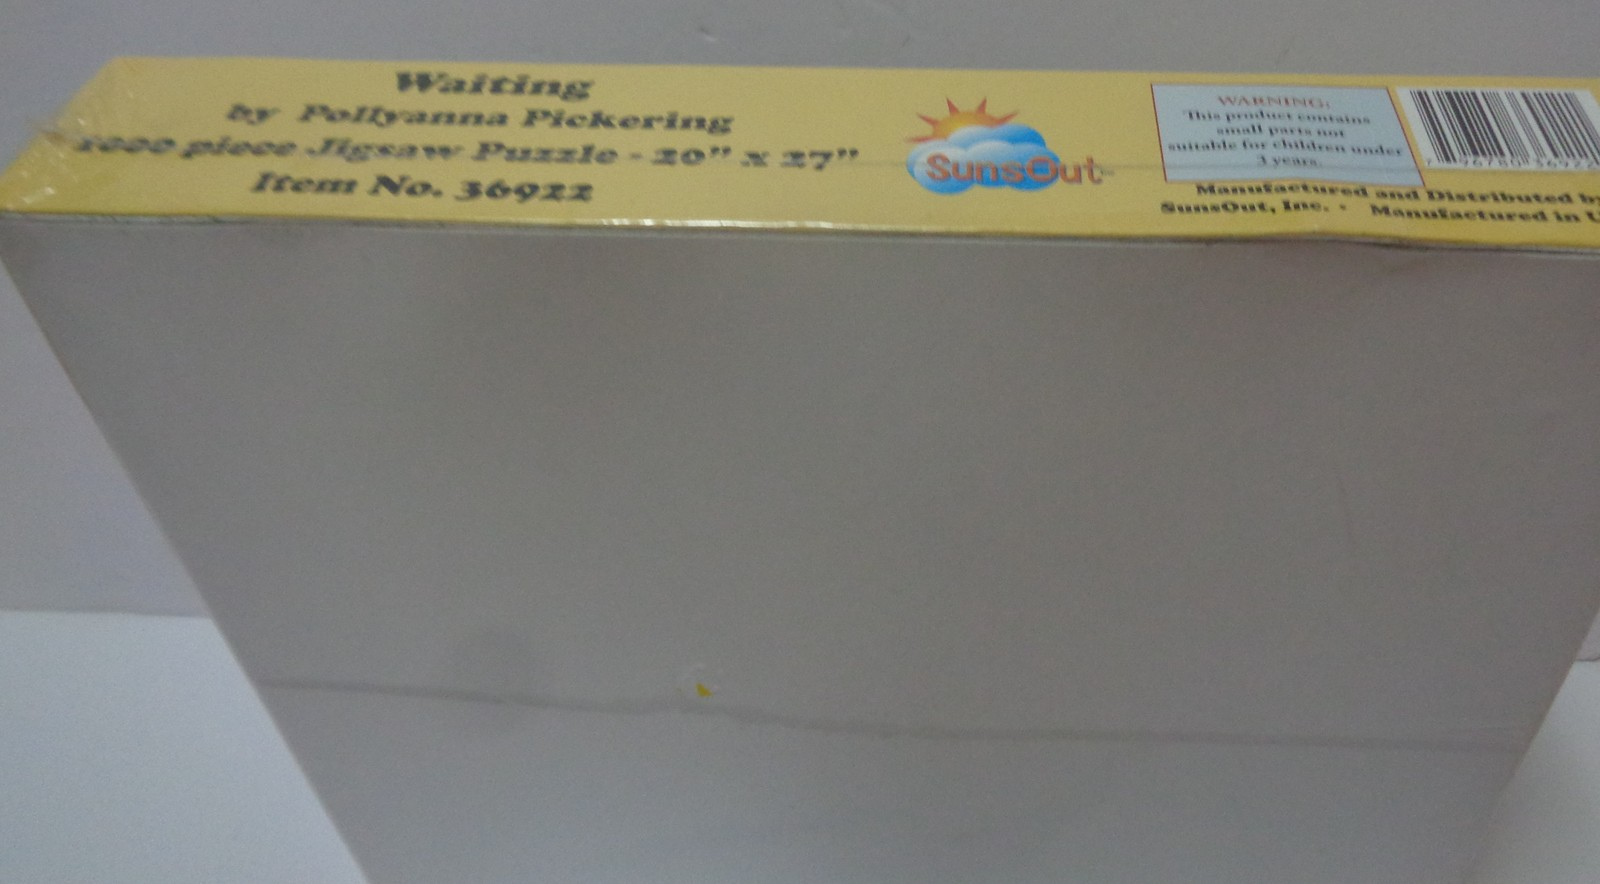 "Waiting by Pollyanna Pickering 1000 Piece Jigsaw Puzzle New Sealed 20"" x 27"" USA"